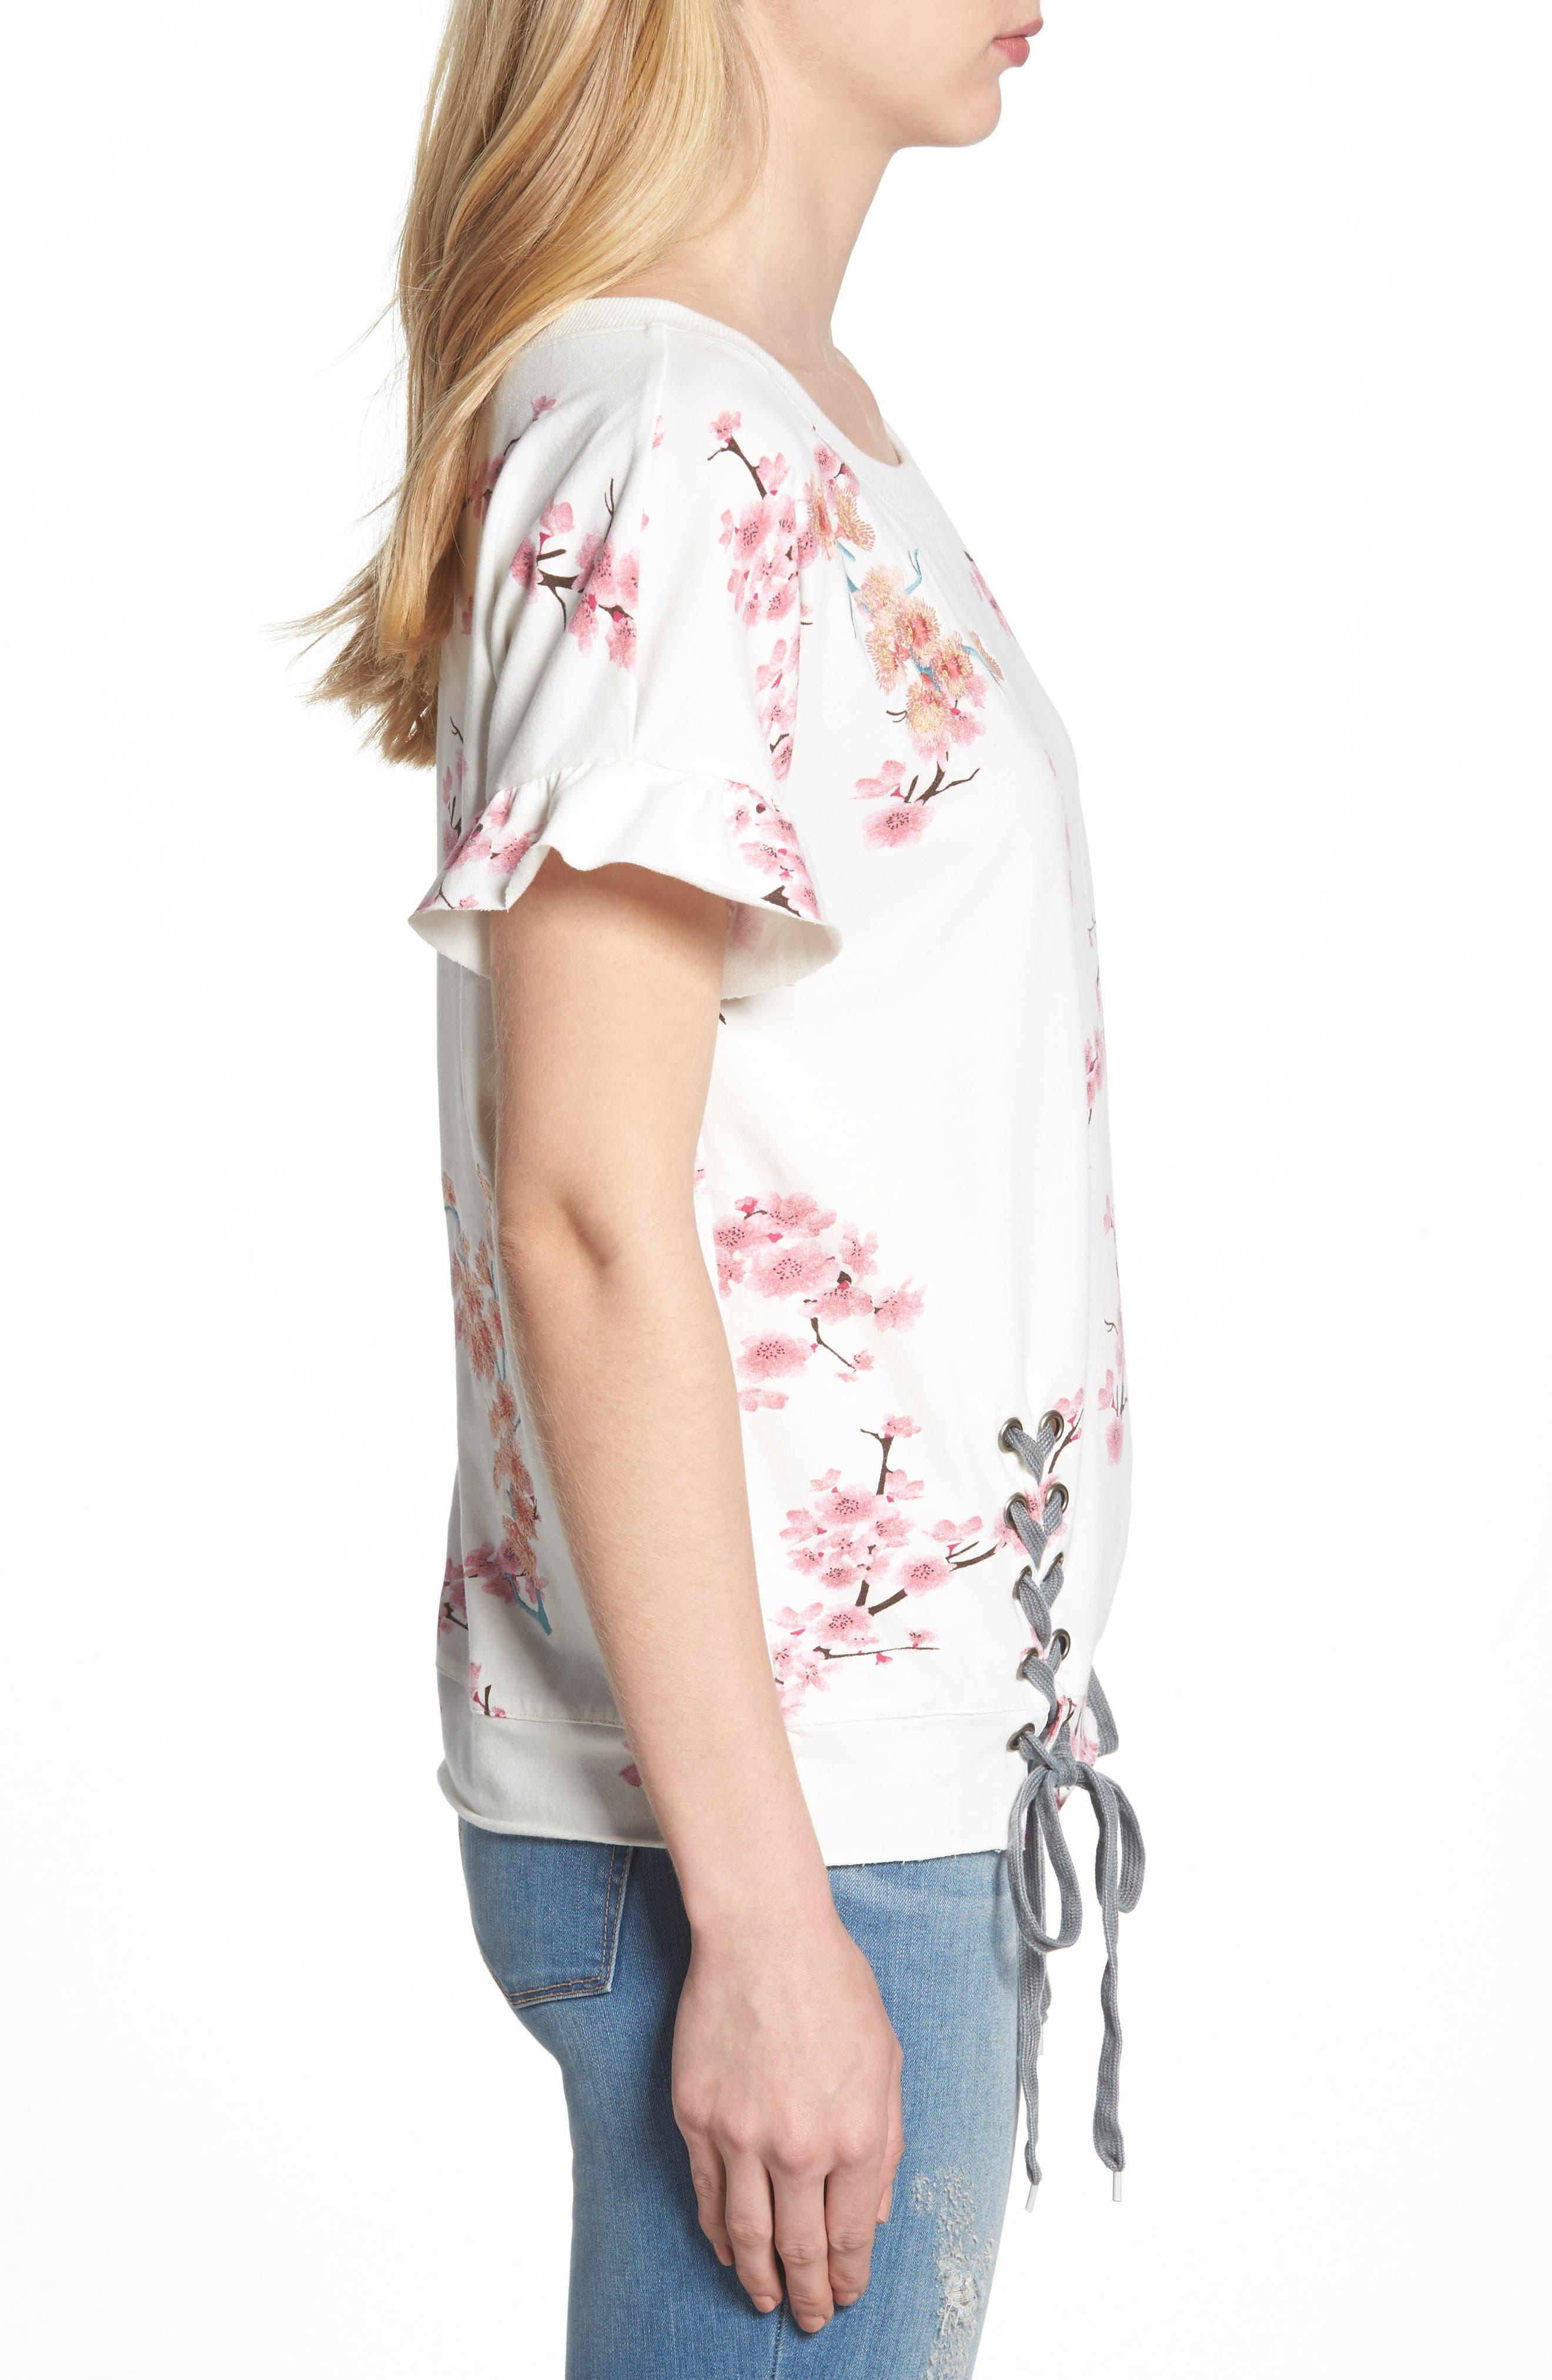 Cherry Blossom Short Sleeve Lace-Up Sweatshirt,                             Alternate thumbnail 3, color,                             WHITE CHERRY BLOSSOM